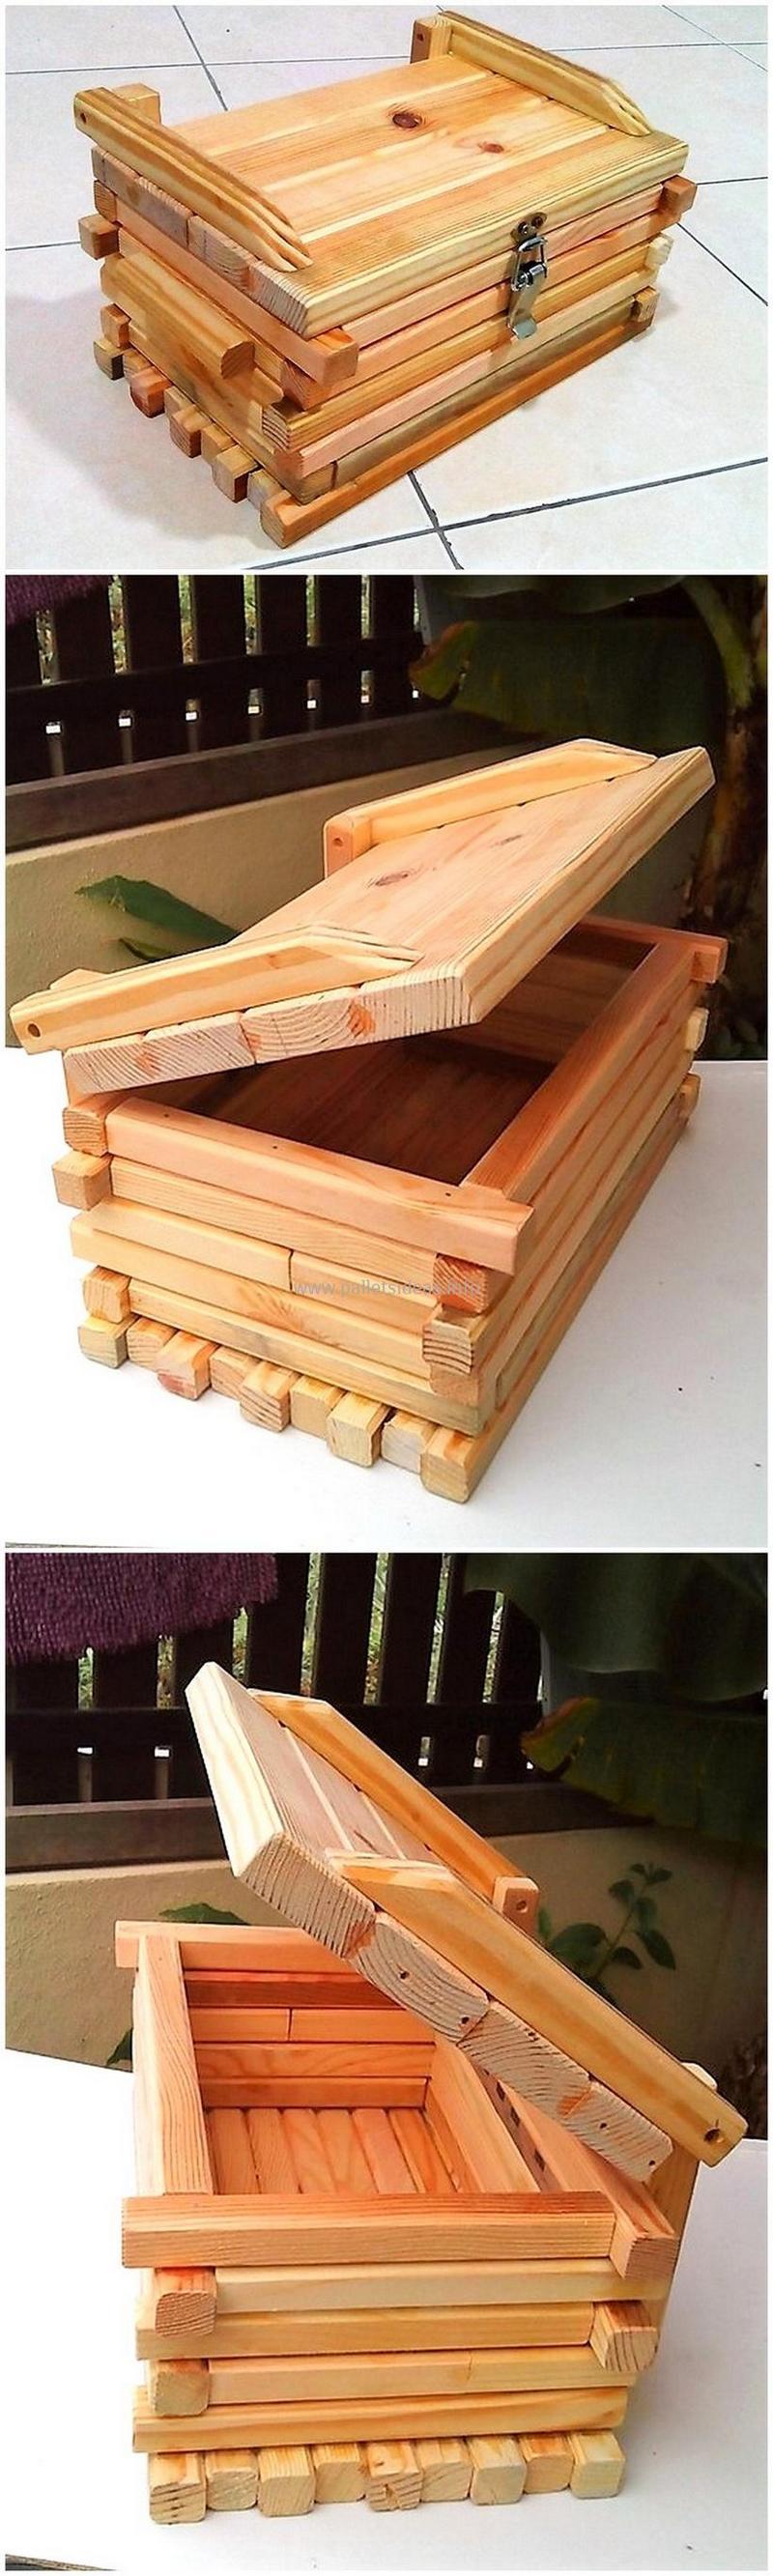 Wood Pallet Chest (7)